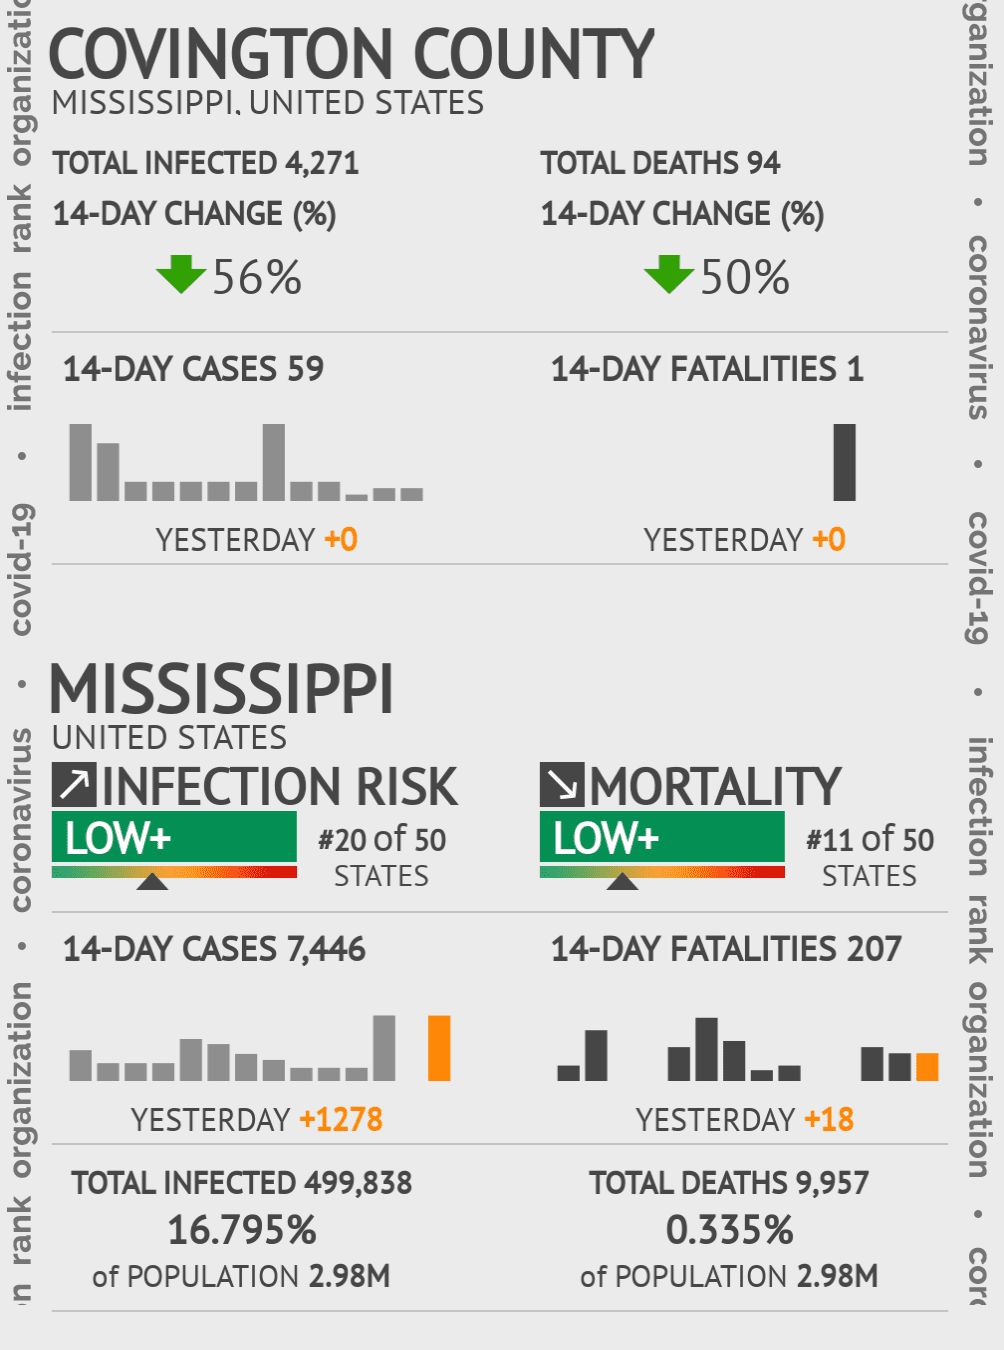 Covington County Coronavirus Covid-19 Risk of Infection on July 24, 2021